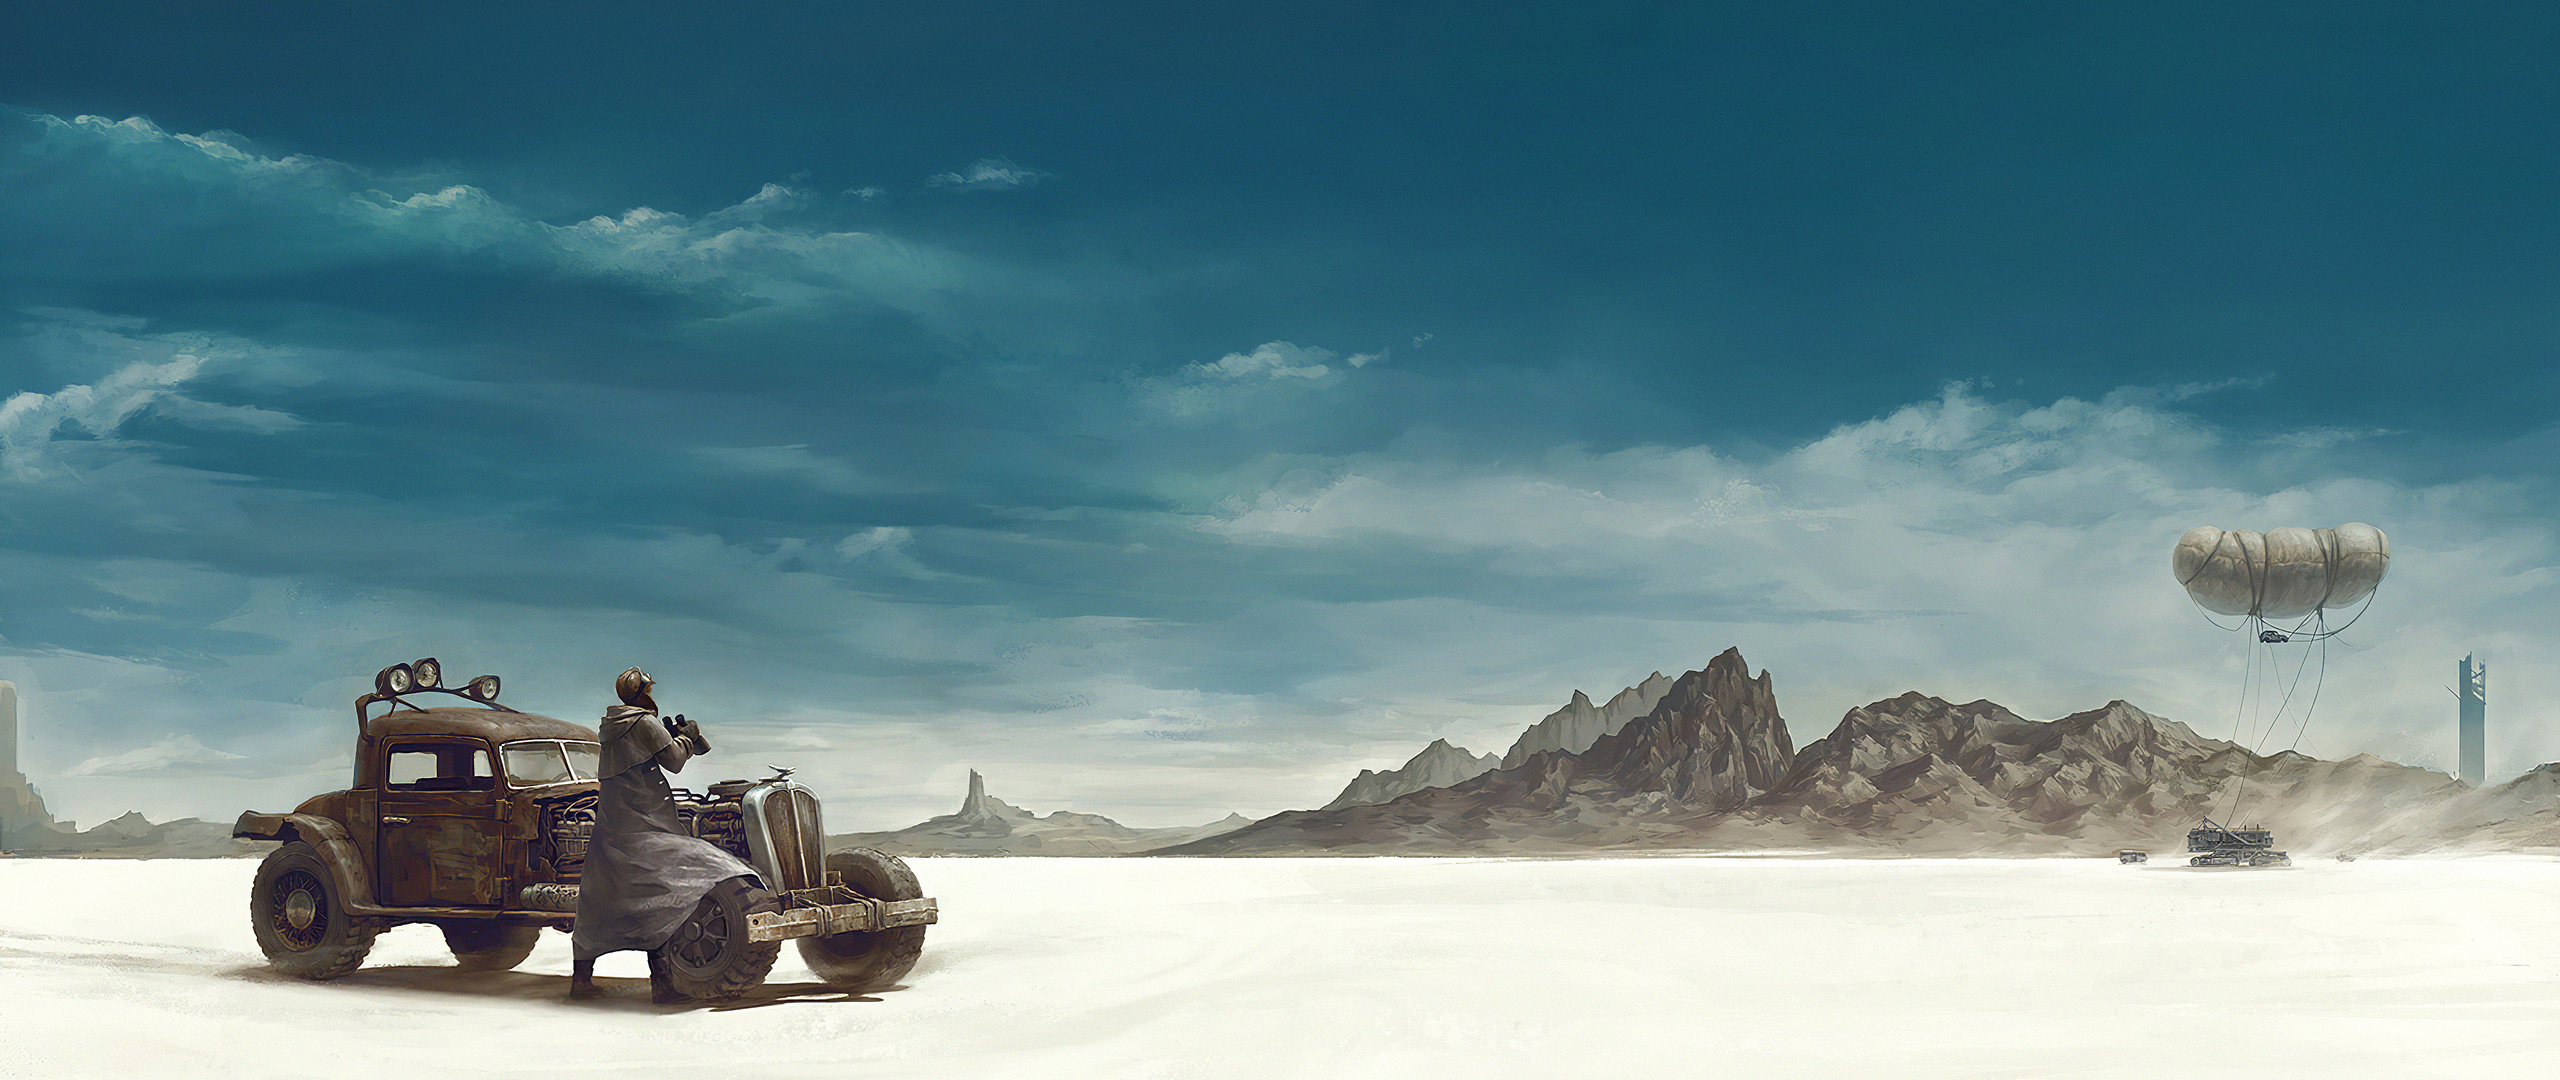 desert-alone-man-car-yv.jpg